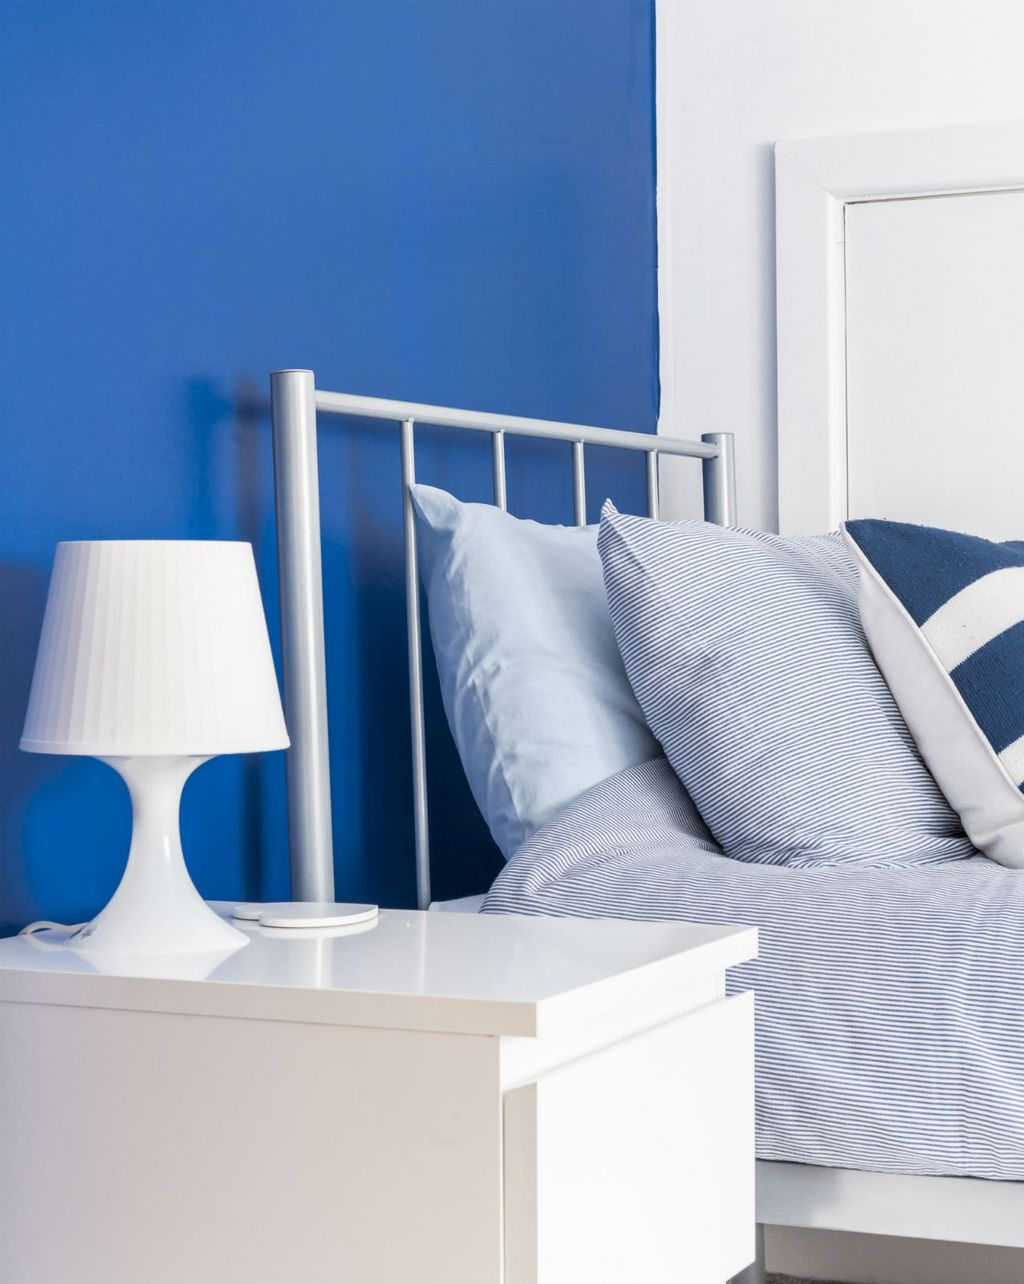 Spavaća soba u morsko plavoj boji najbolje odgovara horoskopskom znaku ribe